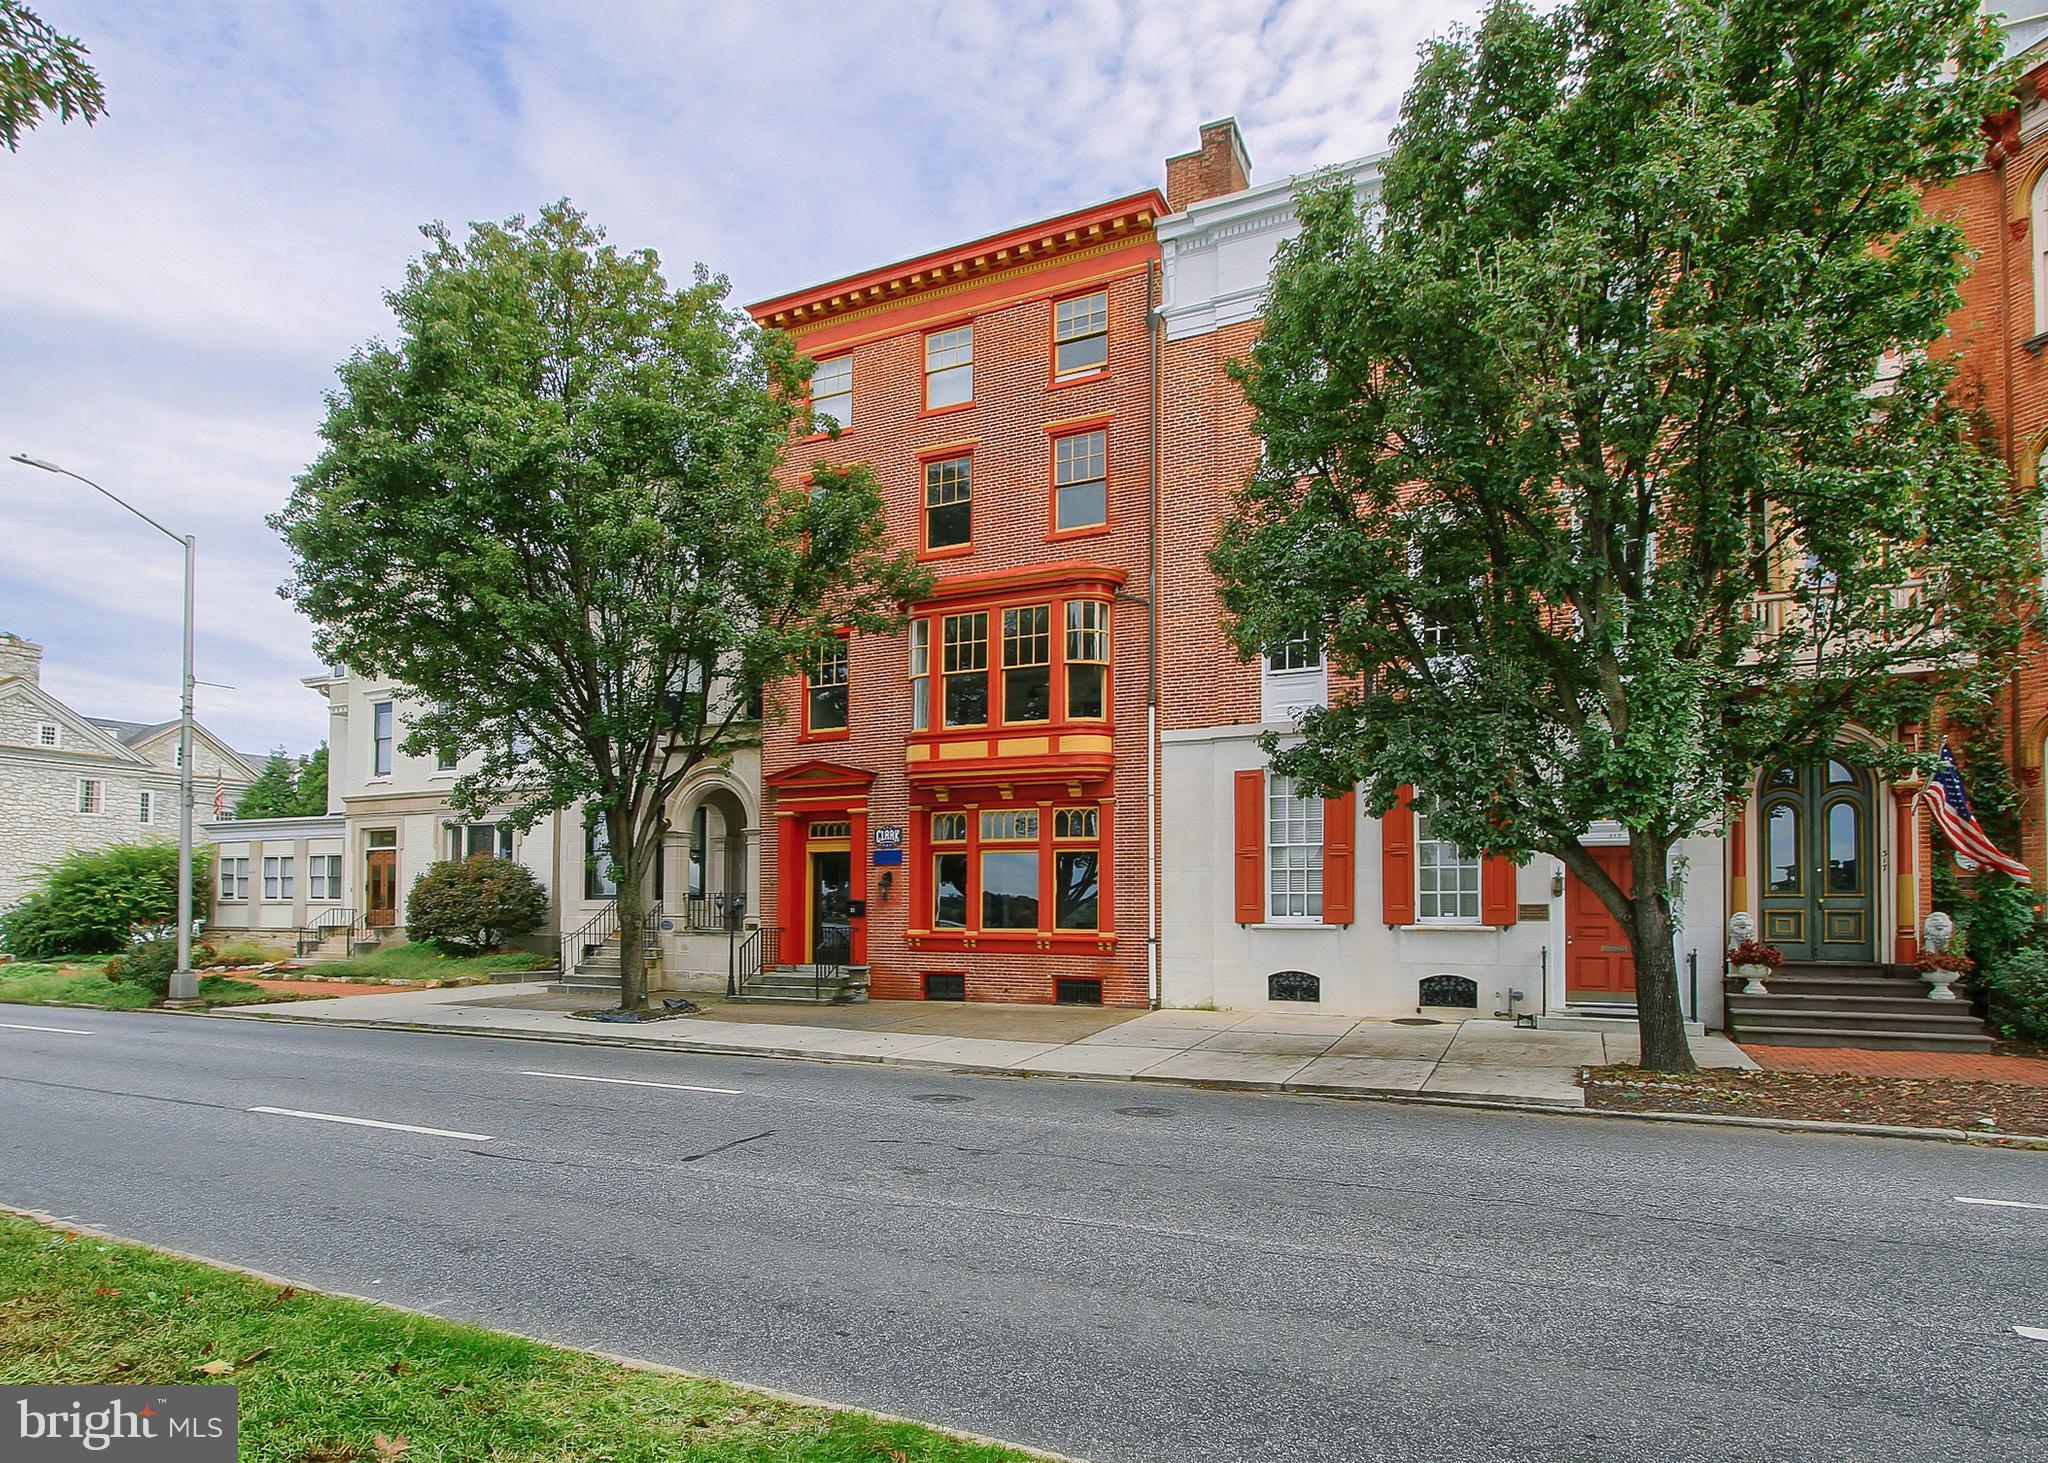 321 N FRONT STREET, HARRISBURG, PA 17101